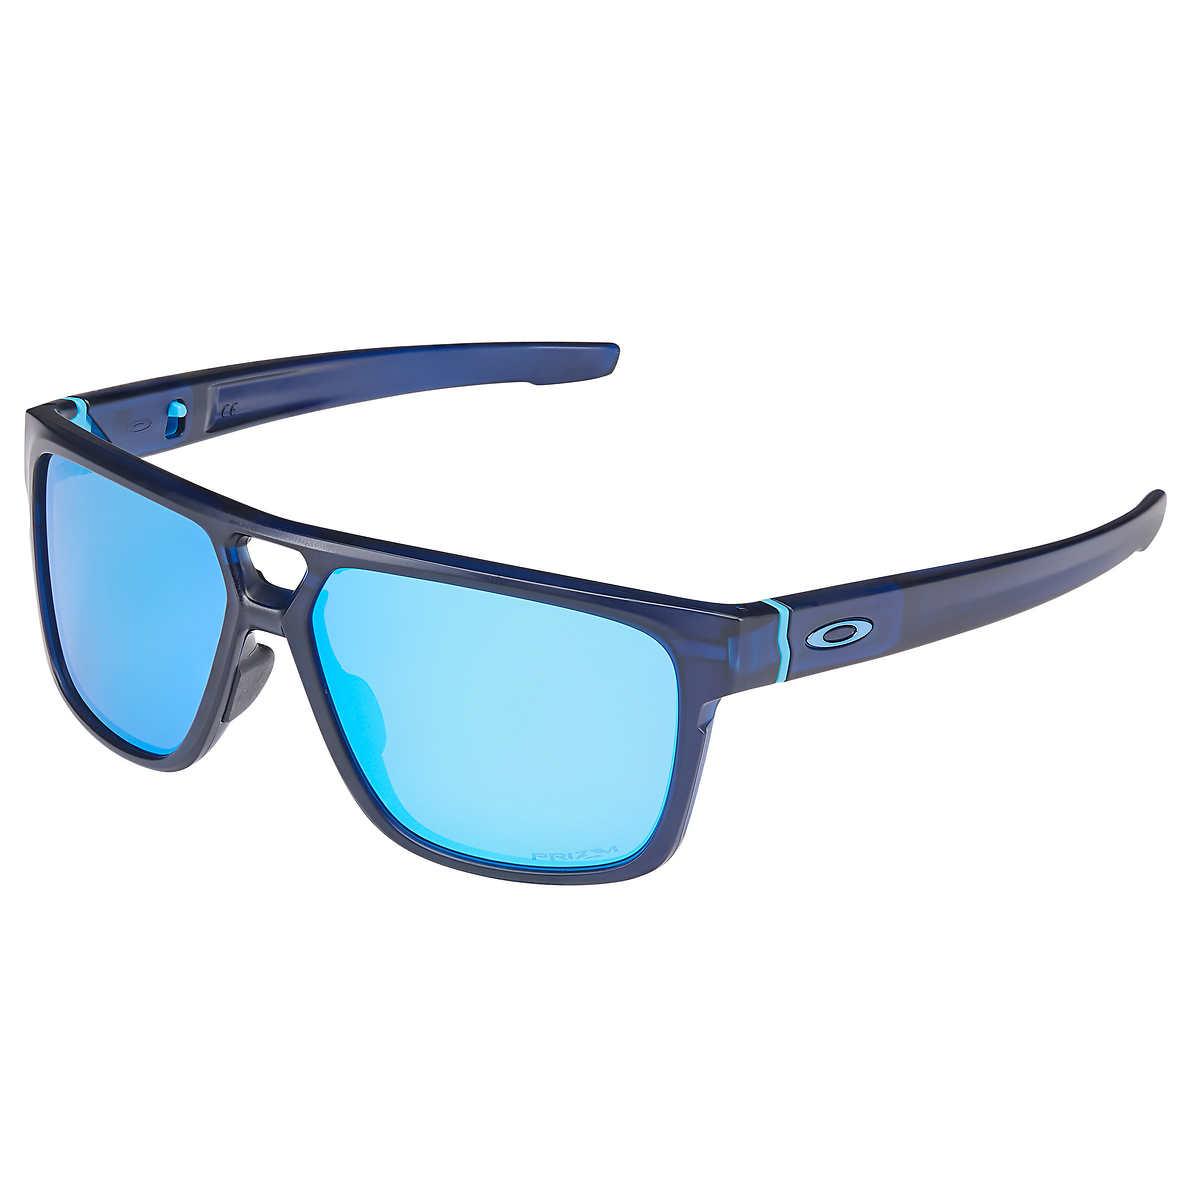 Liive Vision NEW The Animal Polarised Matte Black Orange Smoke Tint Sunglasses